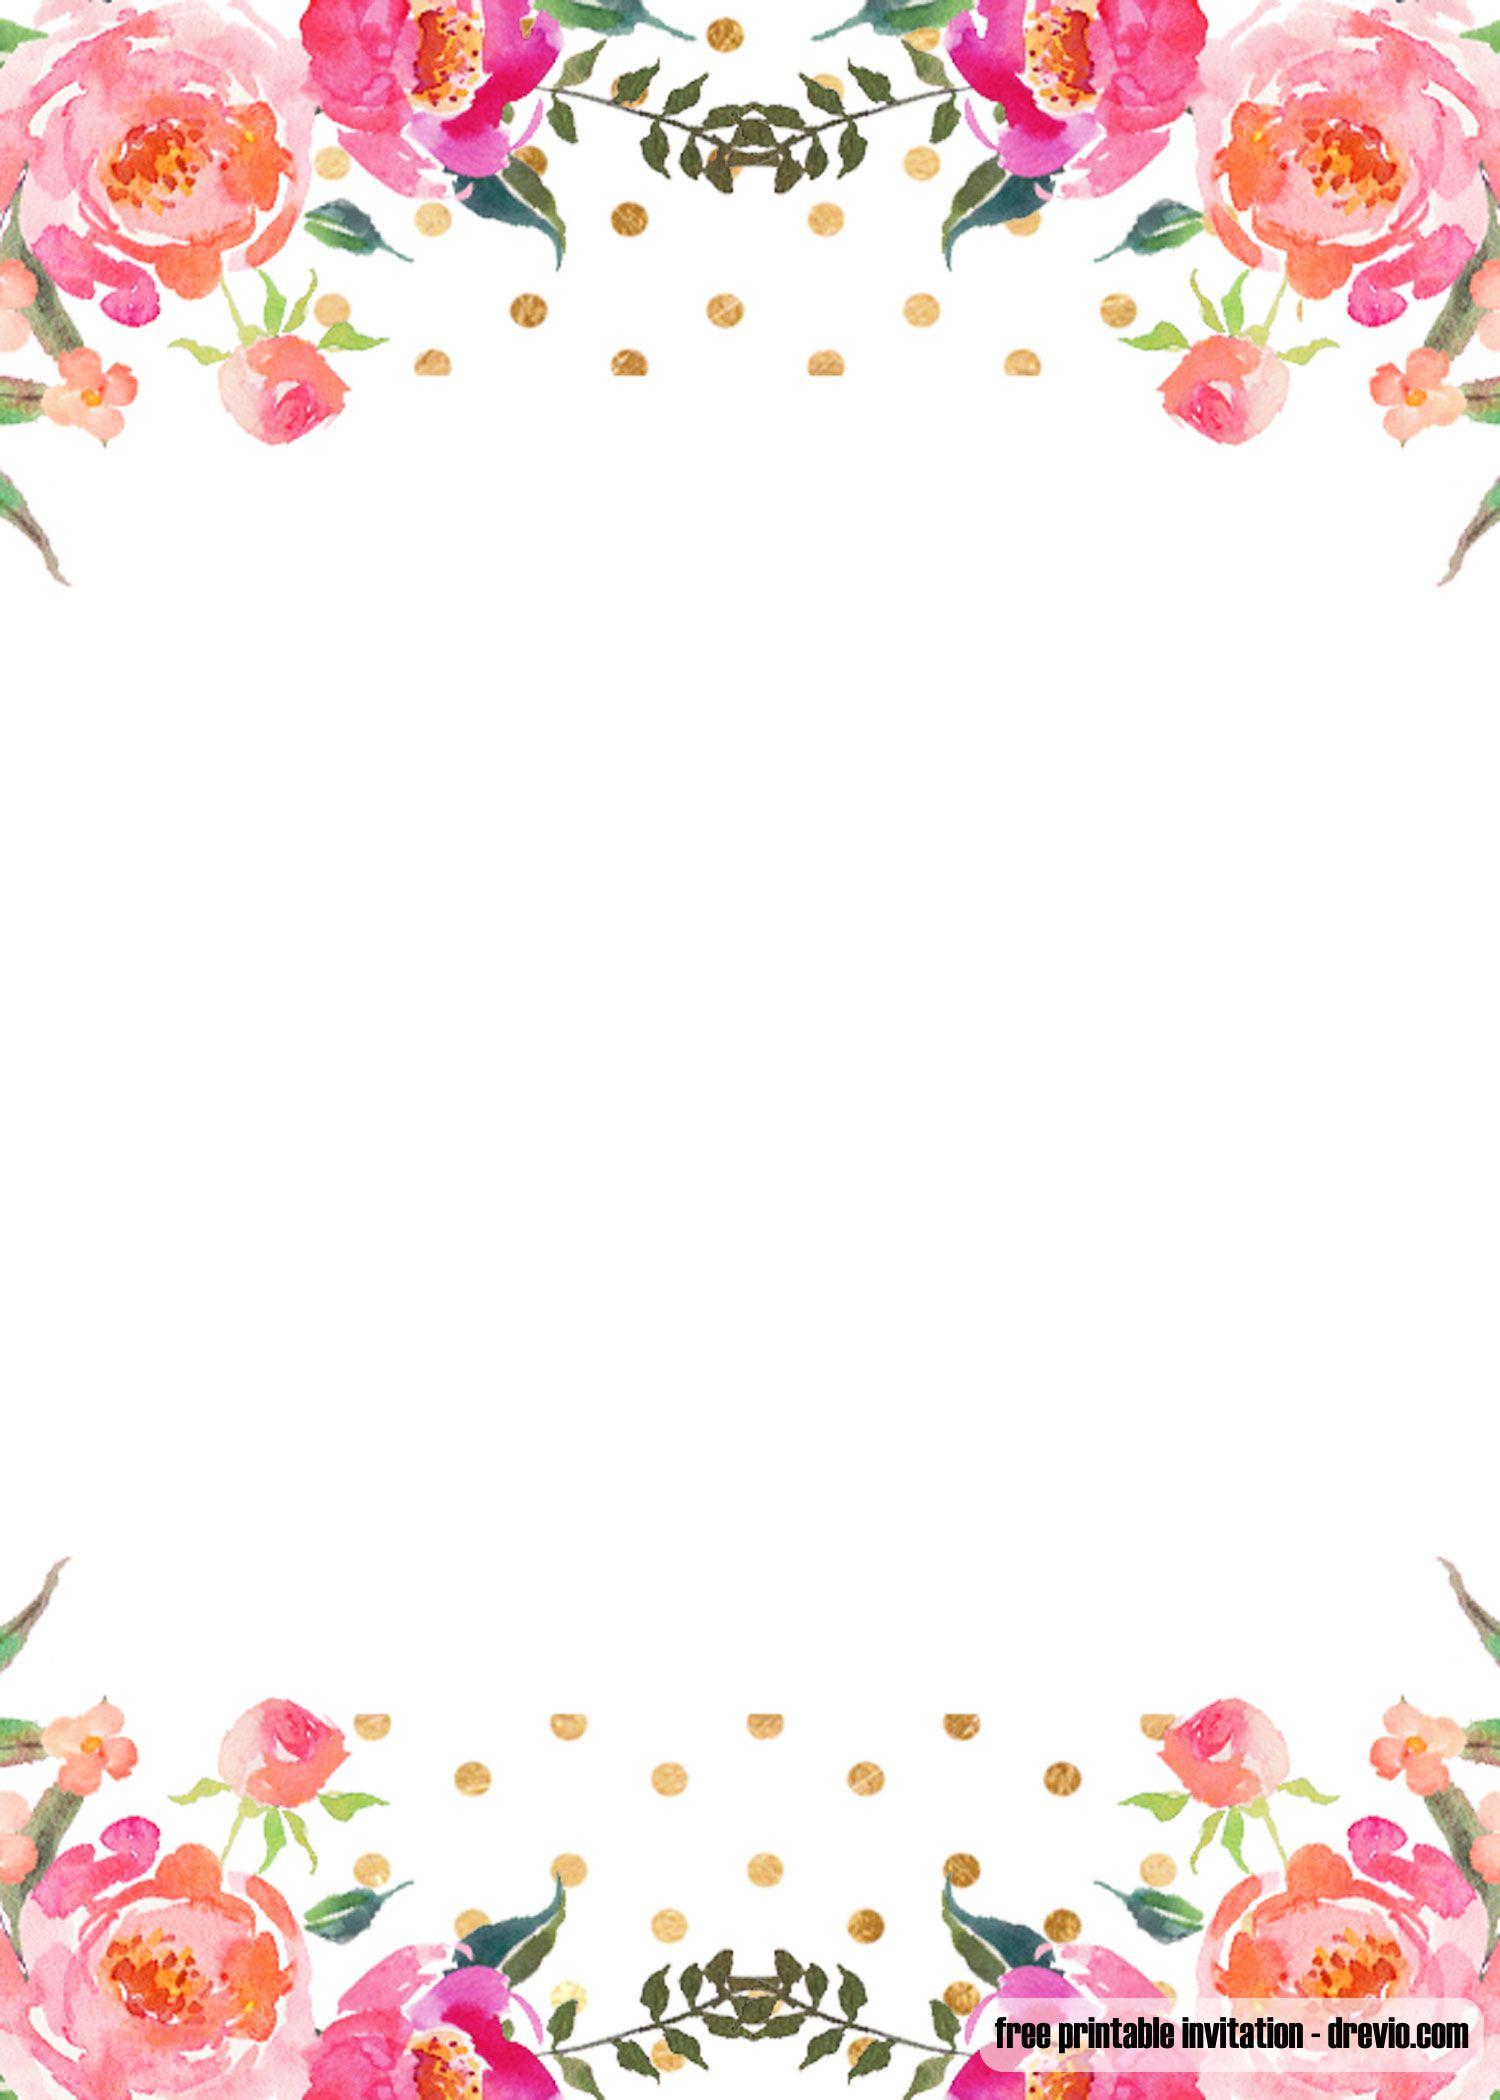 Free Pink Floral Invitation Templates Free Printable Baby Shower Invitations Template Floral Invitations Template Floral Invitation Floral Shower Invitations